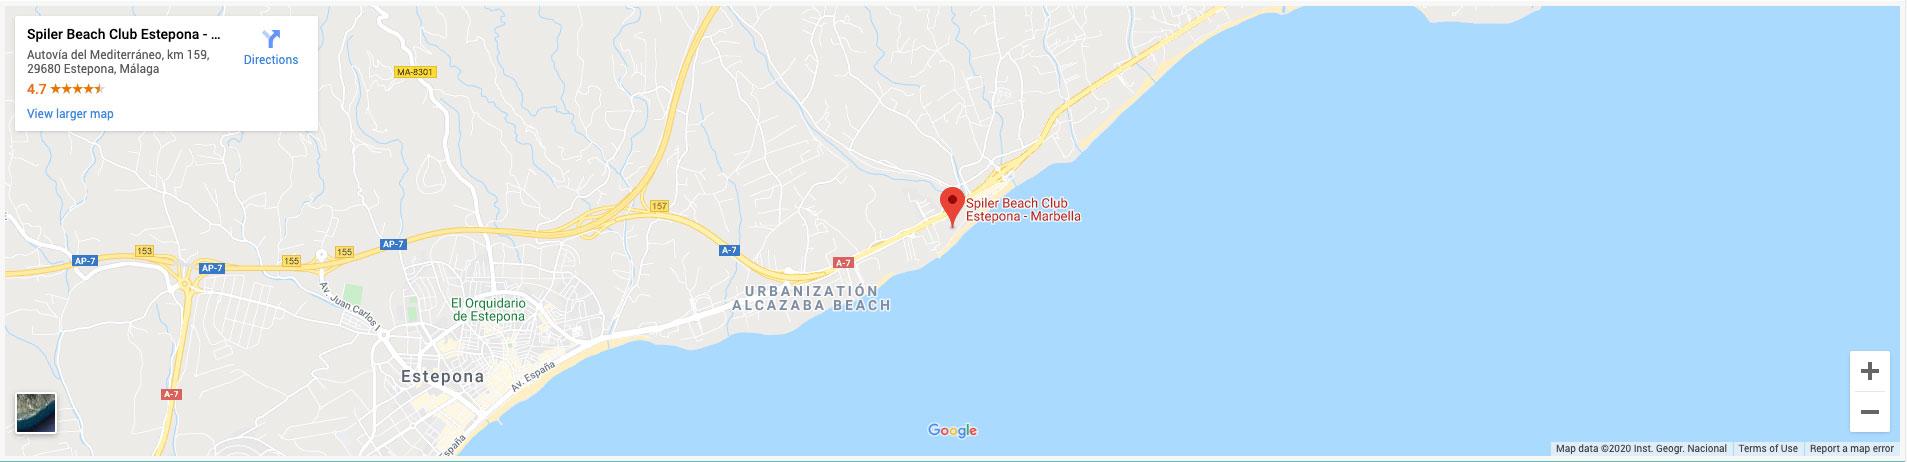 where is spiler beach club estepona marbella